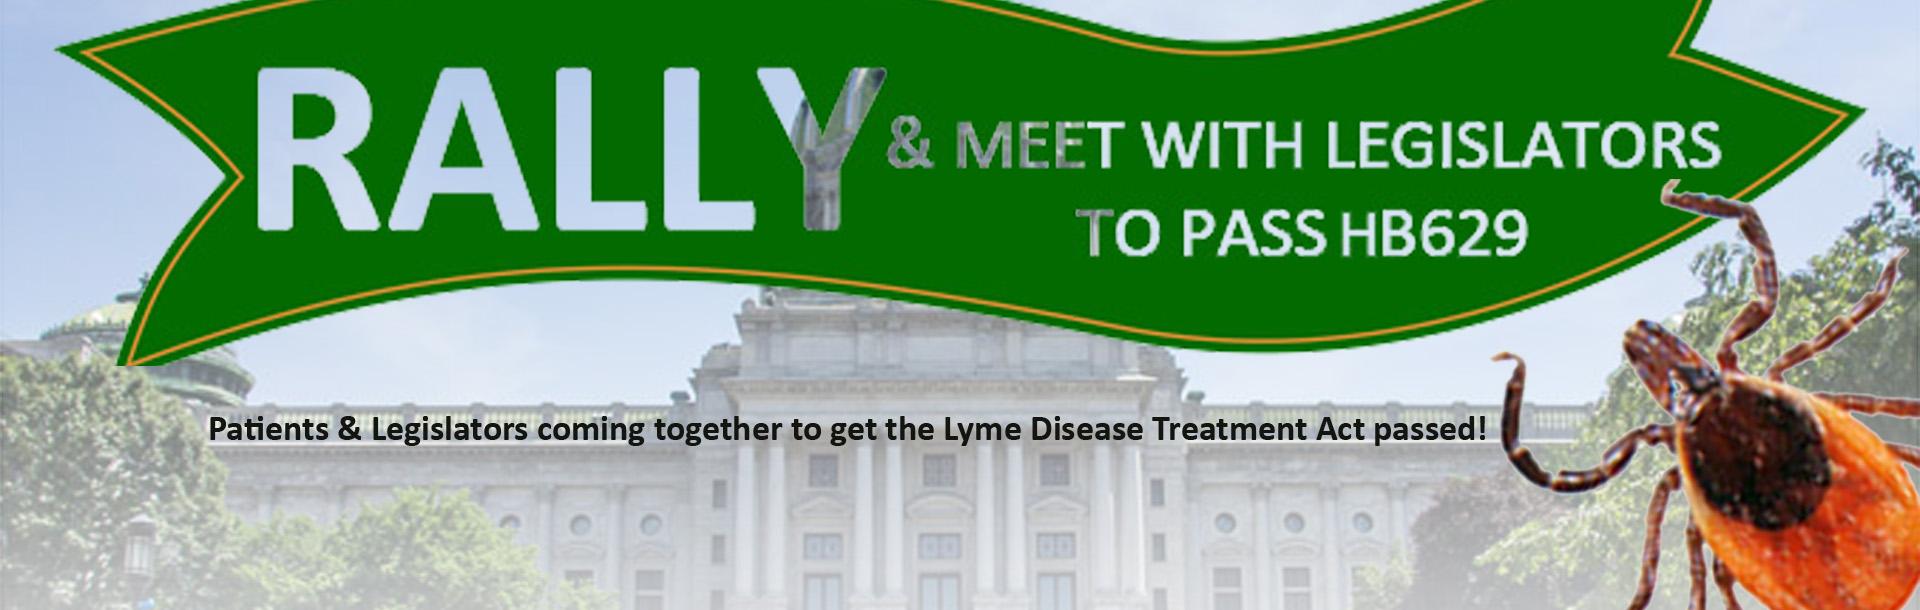 lyme-disease-rally